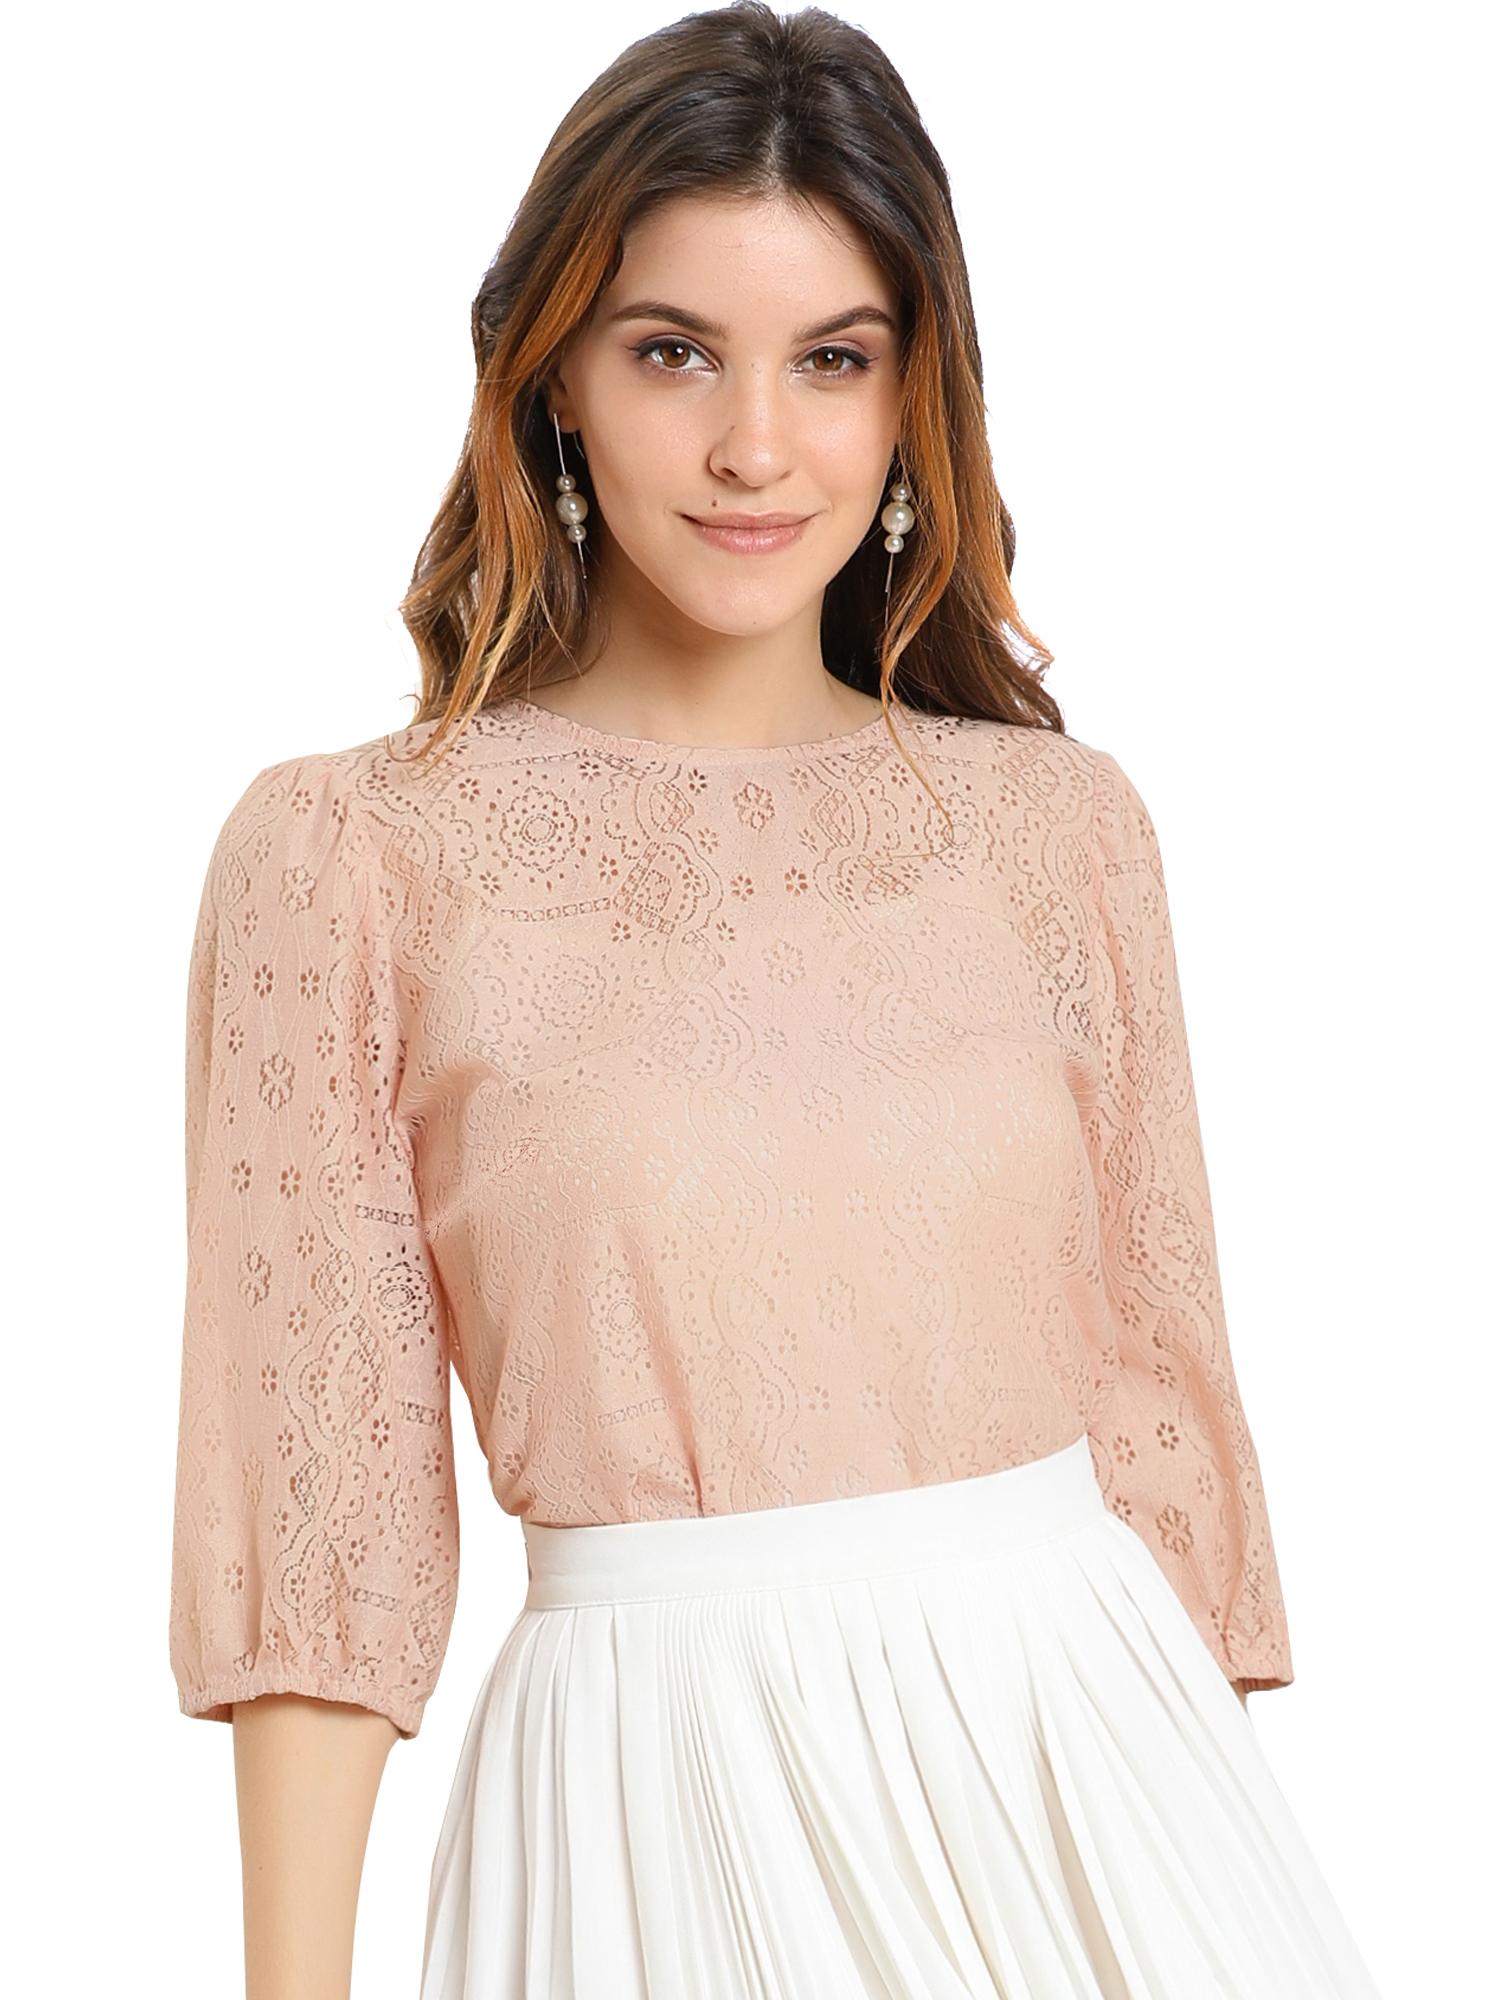 Allegra K Women's 3/4 Lantern Sleeve Semi Sheer Vintage Lace Tops Pink L